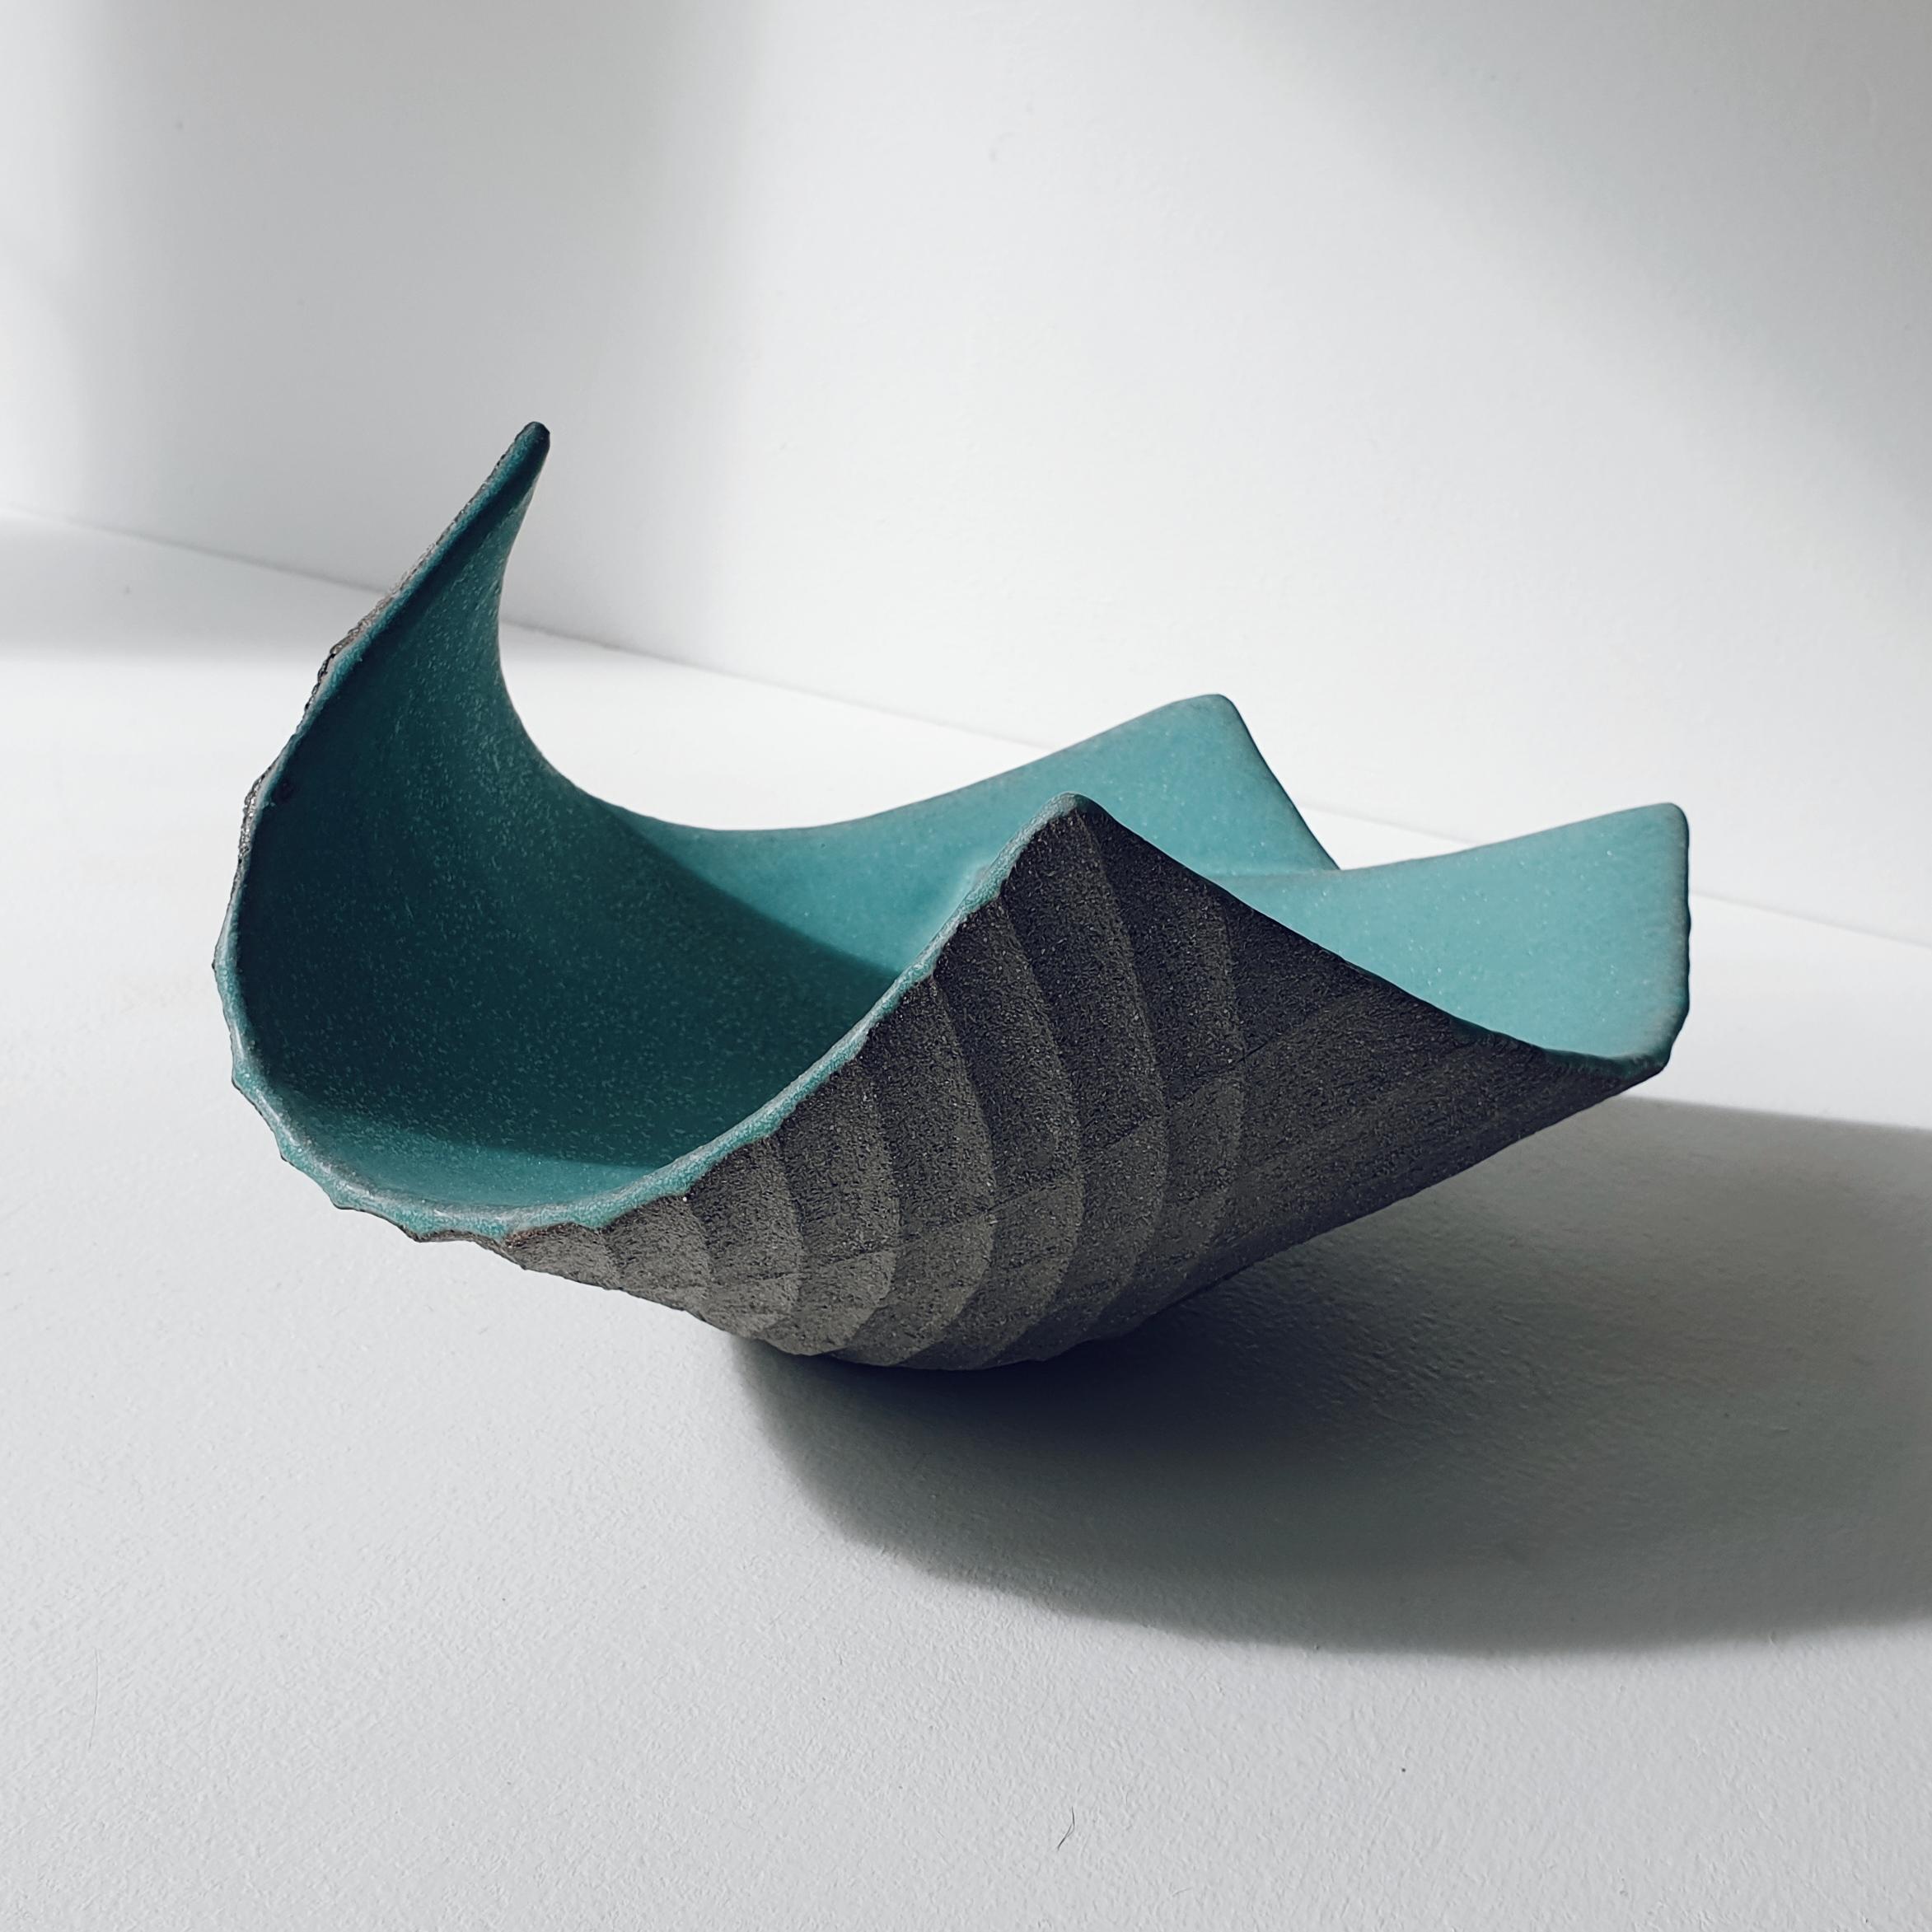 Michele Bianco. Flight vessel (sea green, overlap)